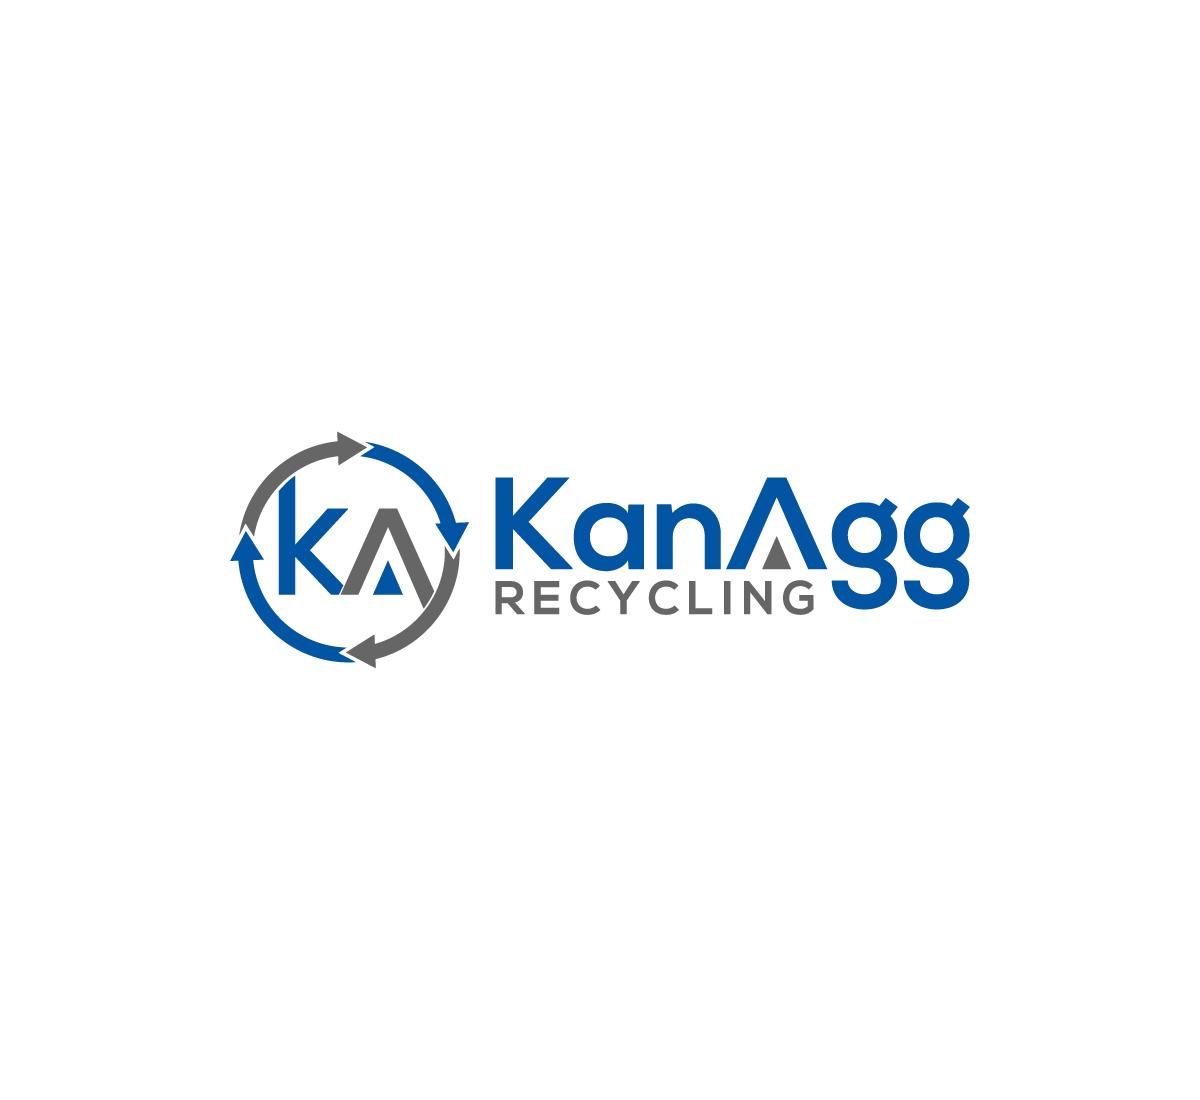 KanAgg Recycling